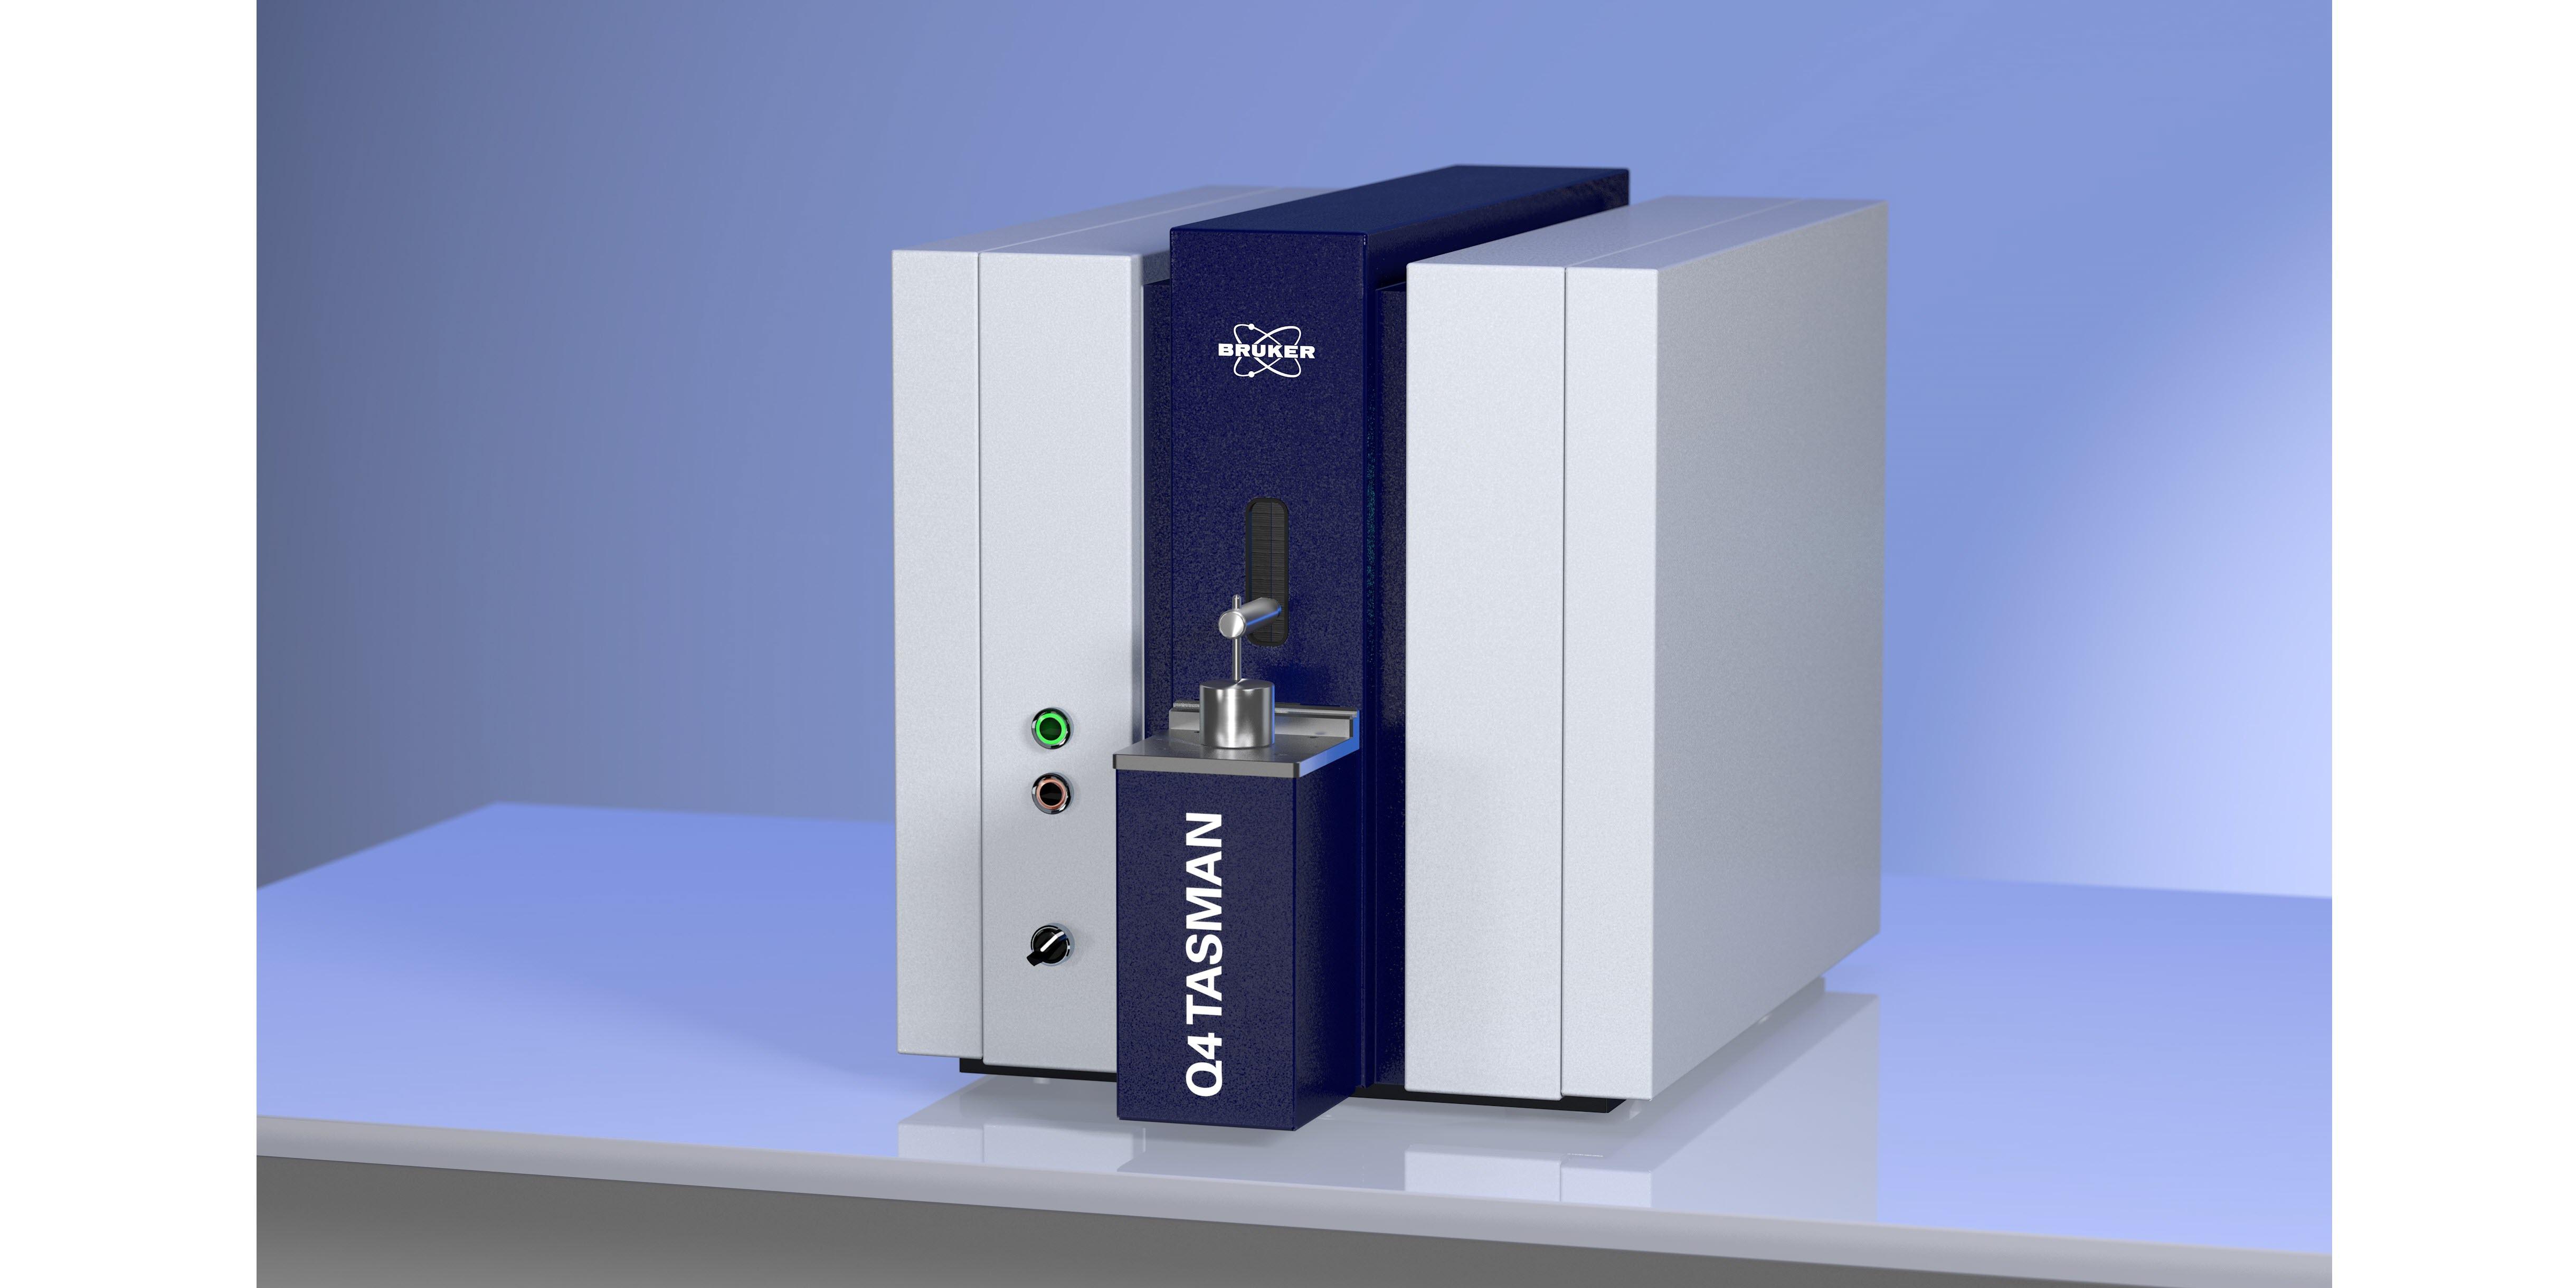 Bruker Launches the Q4 TASMAN Series 2 Advanced Spark-OES Metals Analyzer